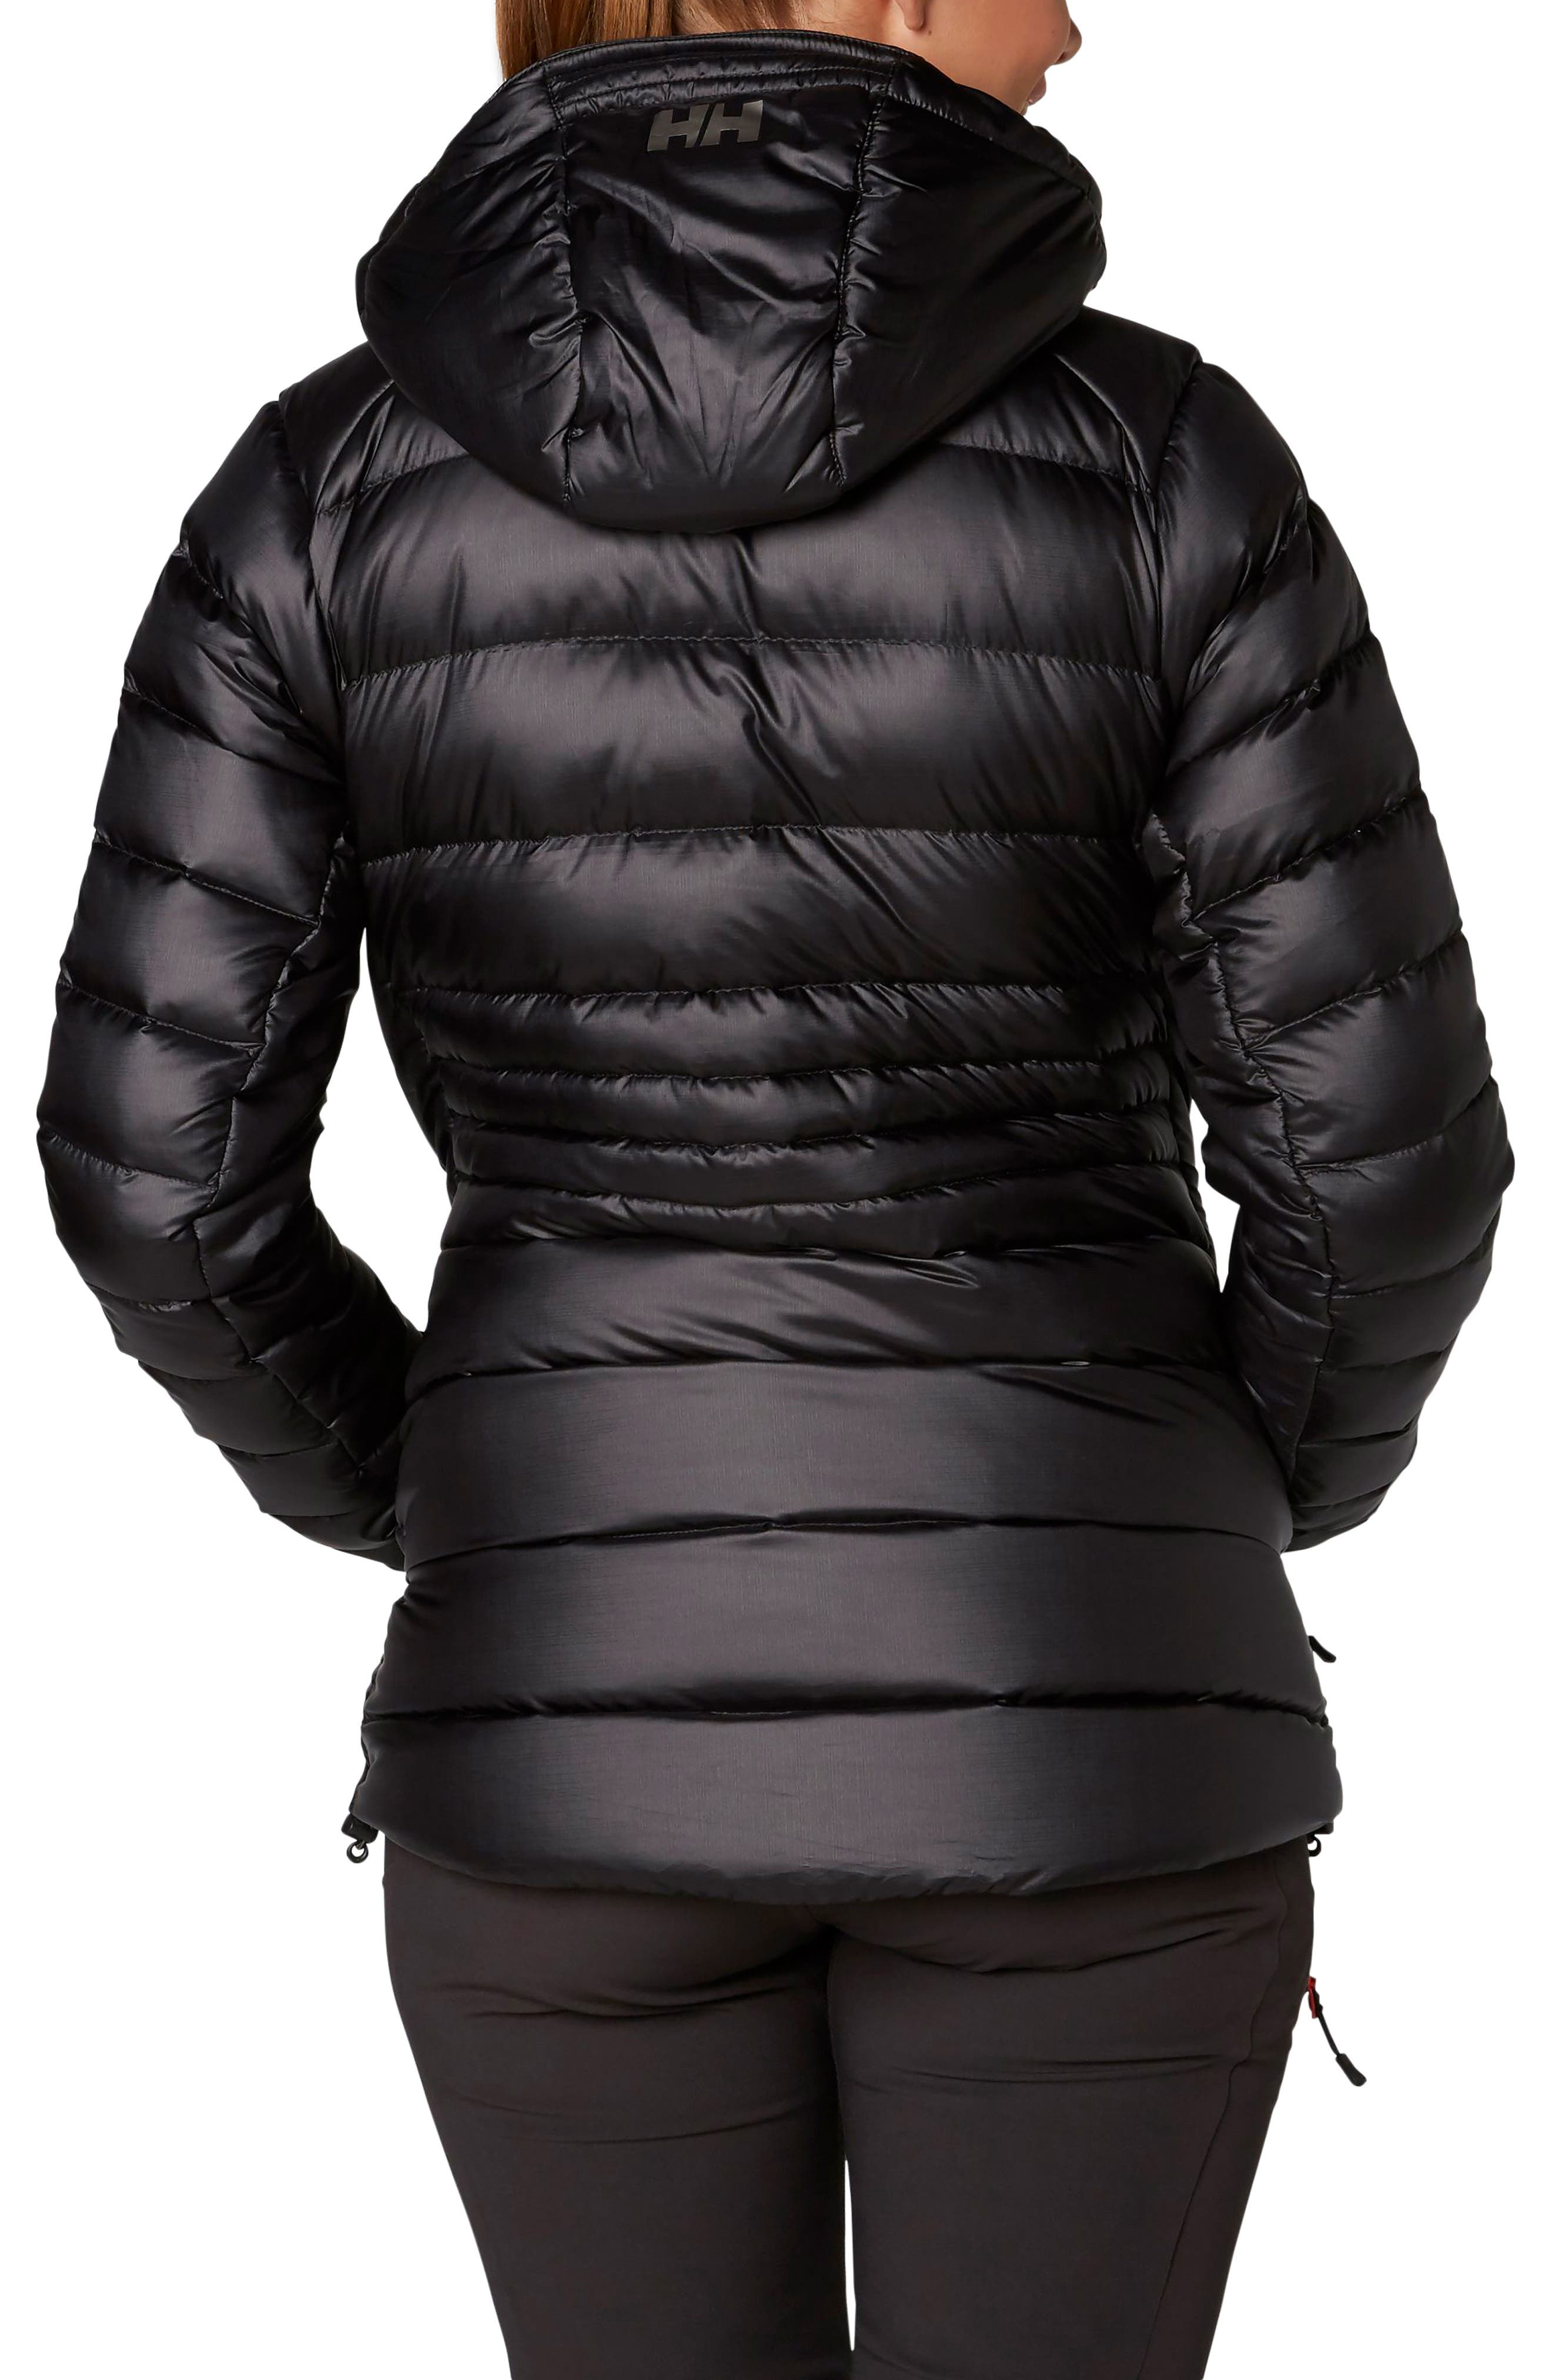 Vanir Icefall Down Jacket,                             Alternate thumbnail 2, color,                             Black